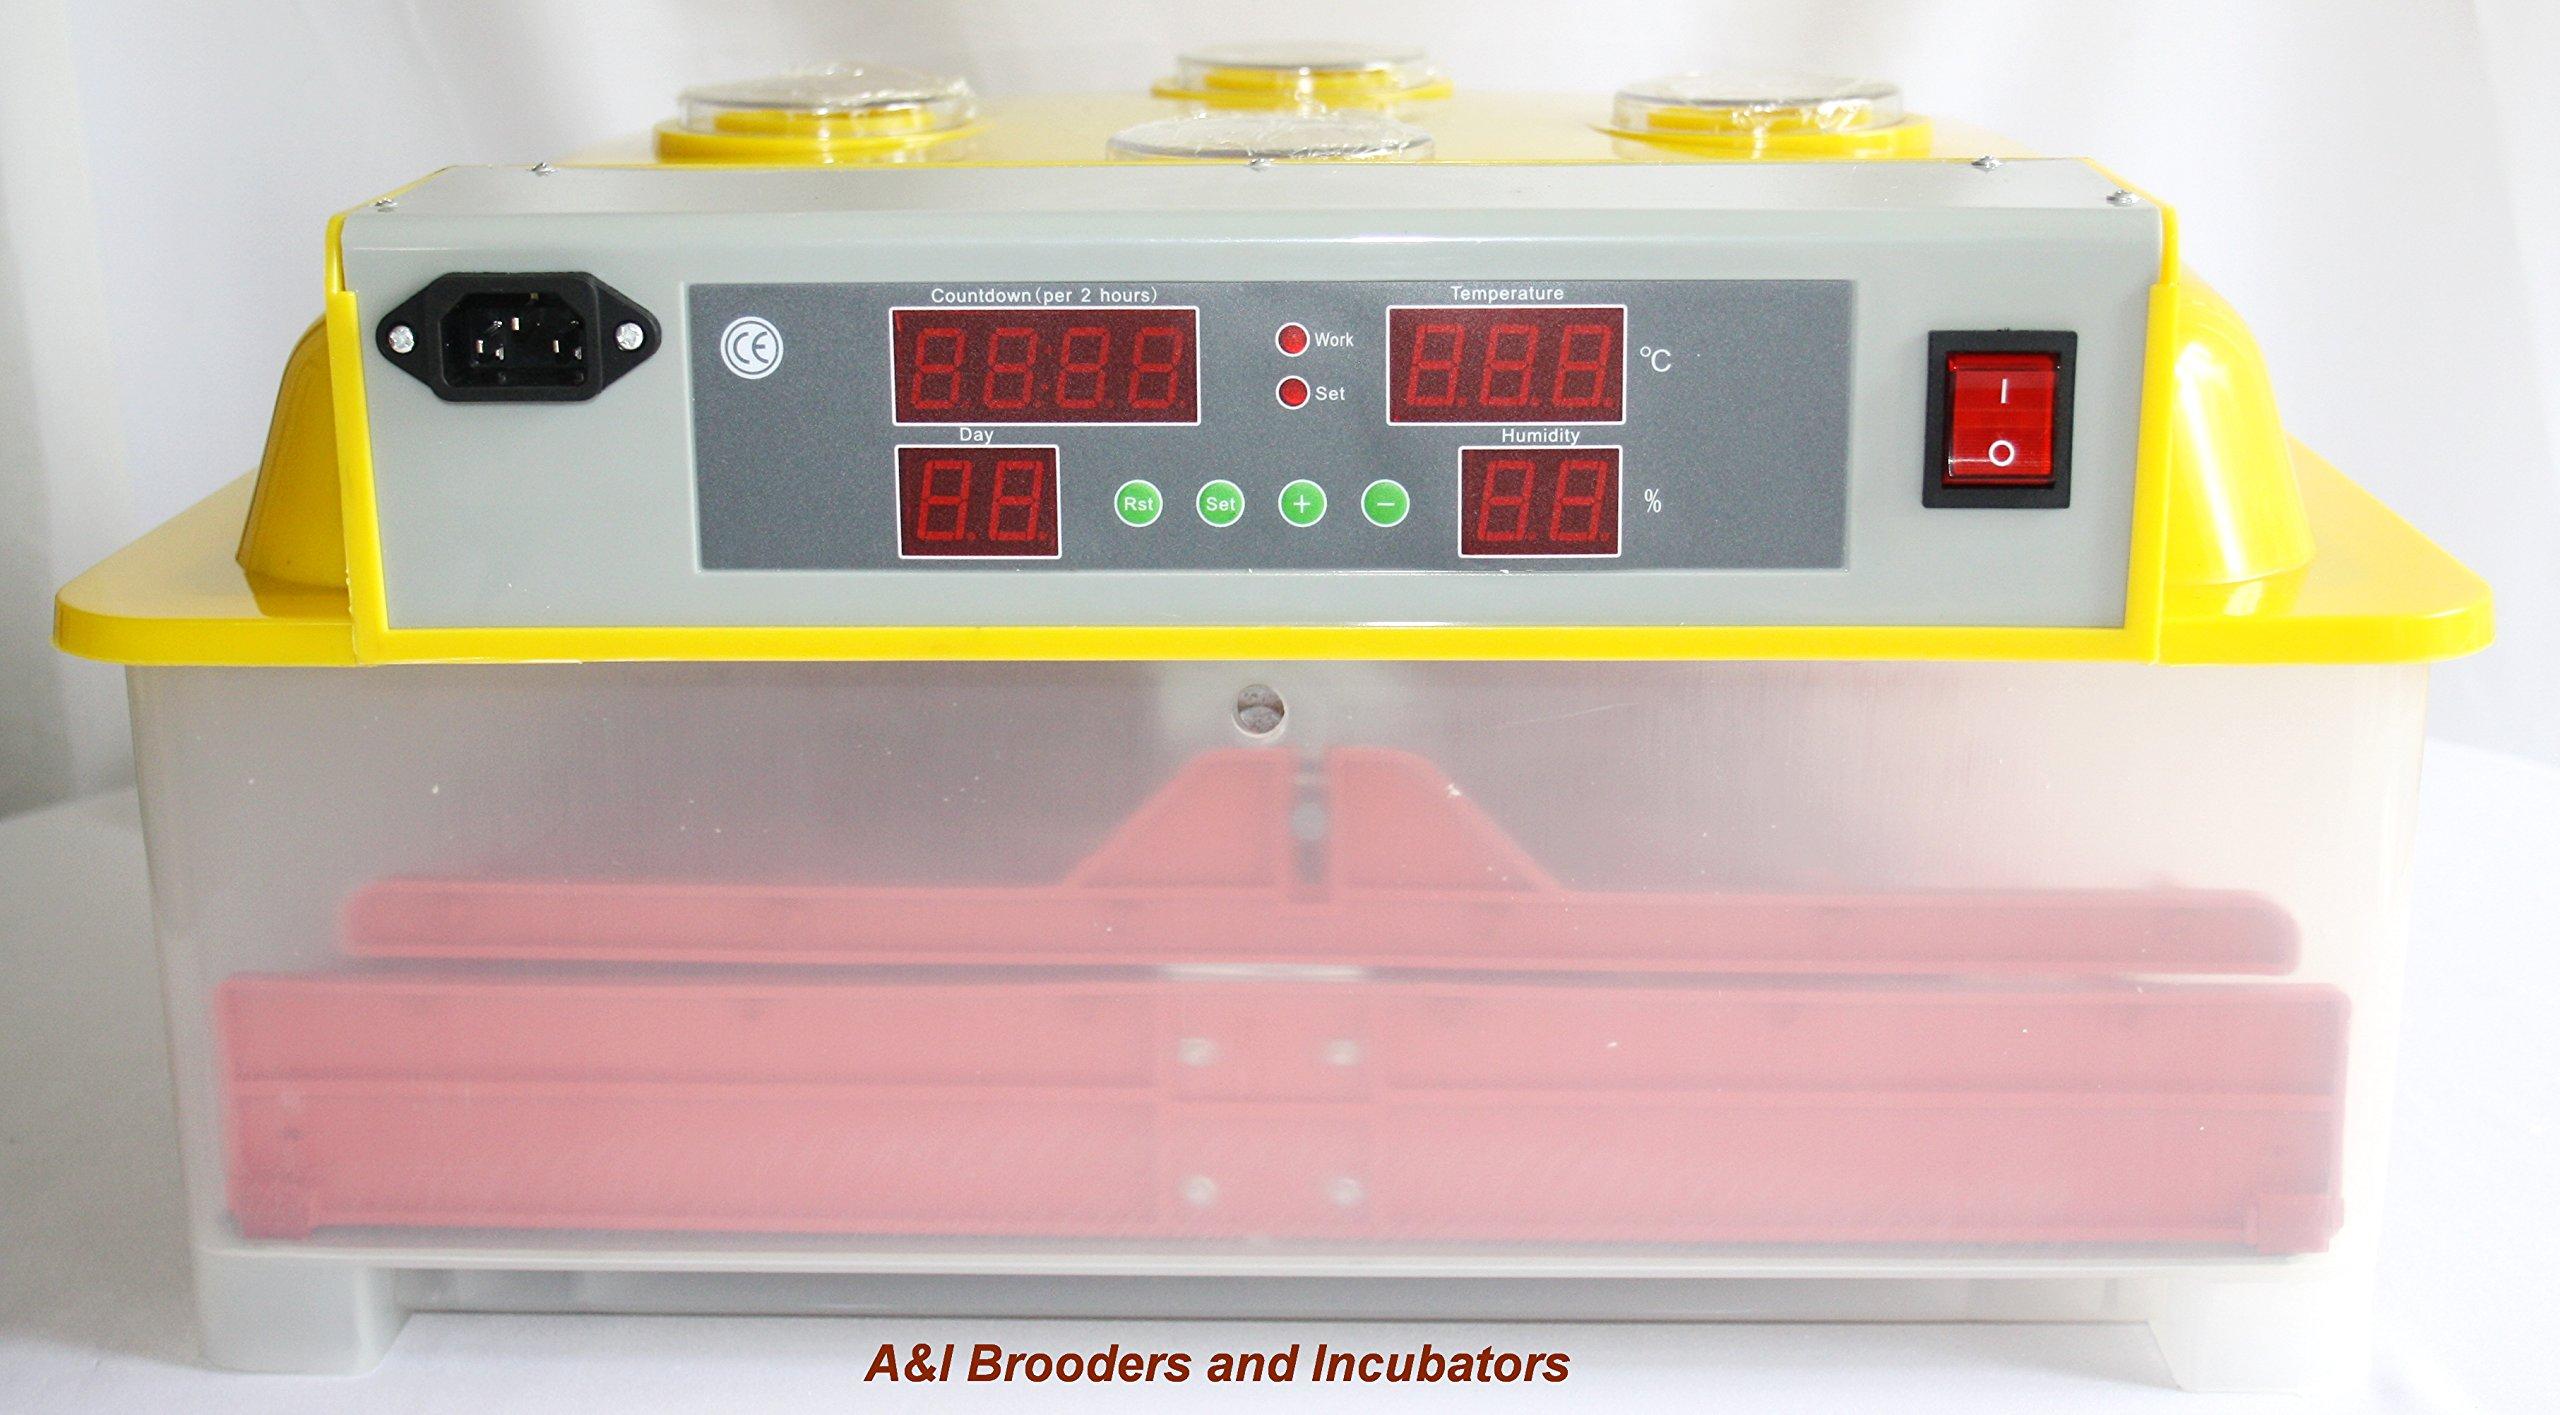 A&I - 144 Quail Egg Digital Incubator / Hatcher AUTOMATIC TURNER Avian Poultry Local USA DISTRIBUTOR 110 Volt Full Warranty